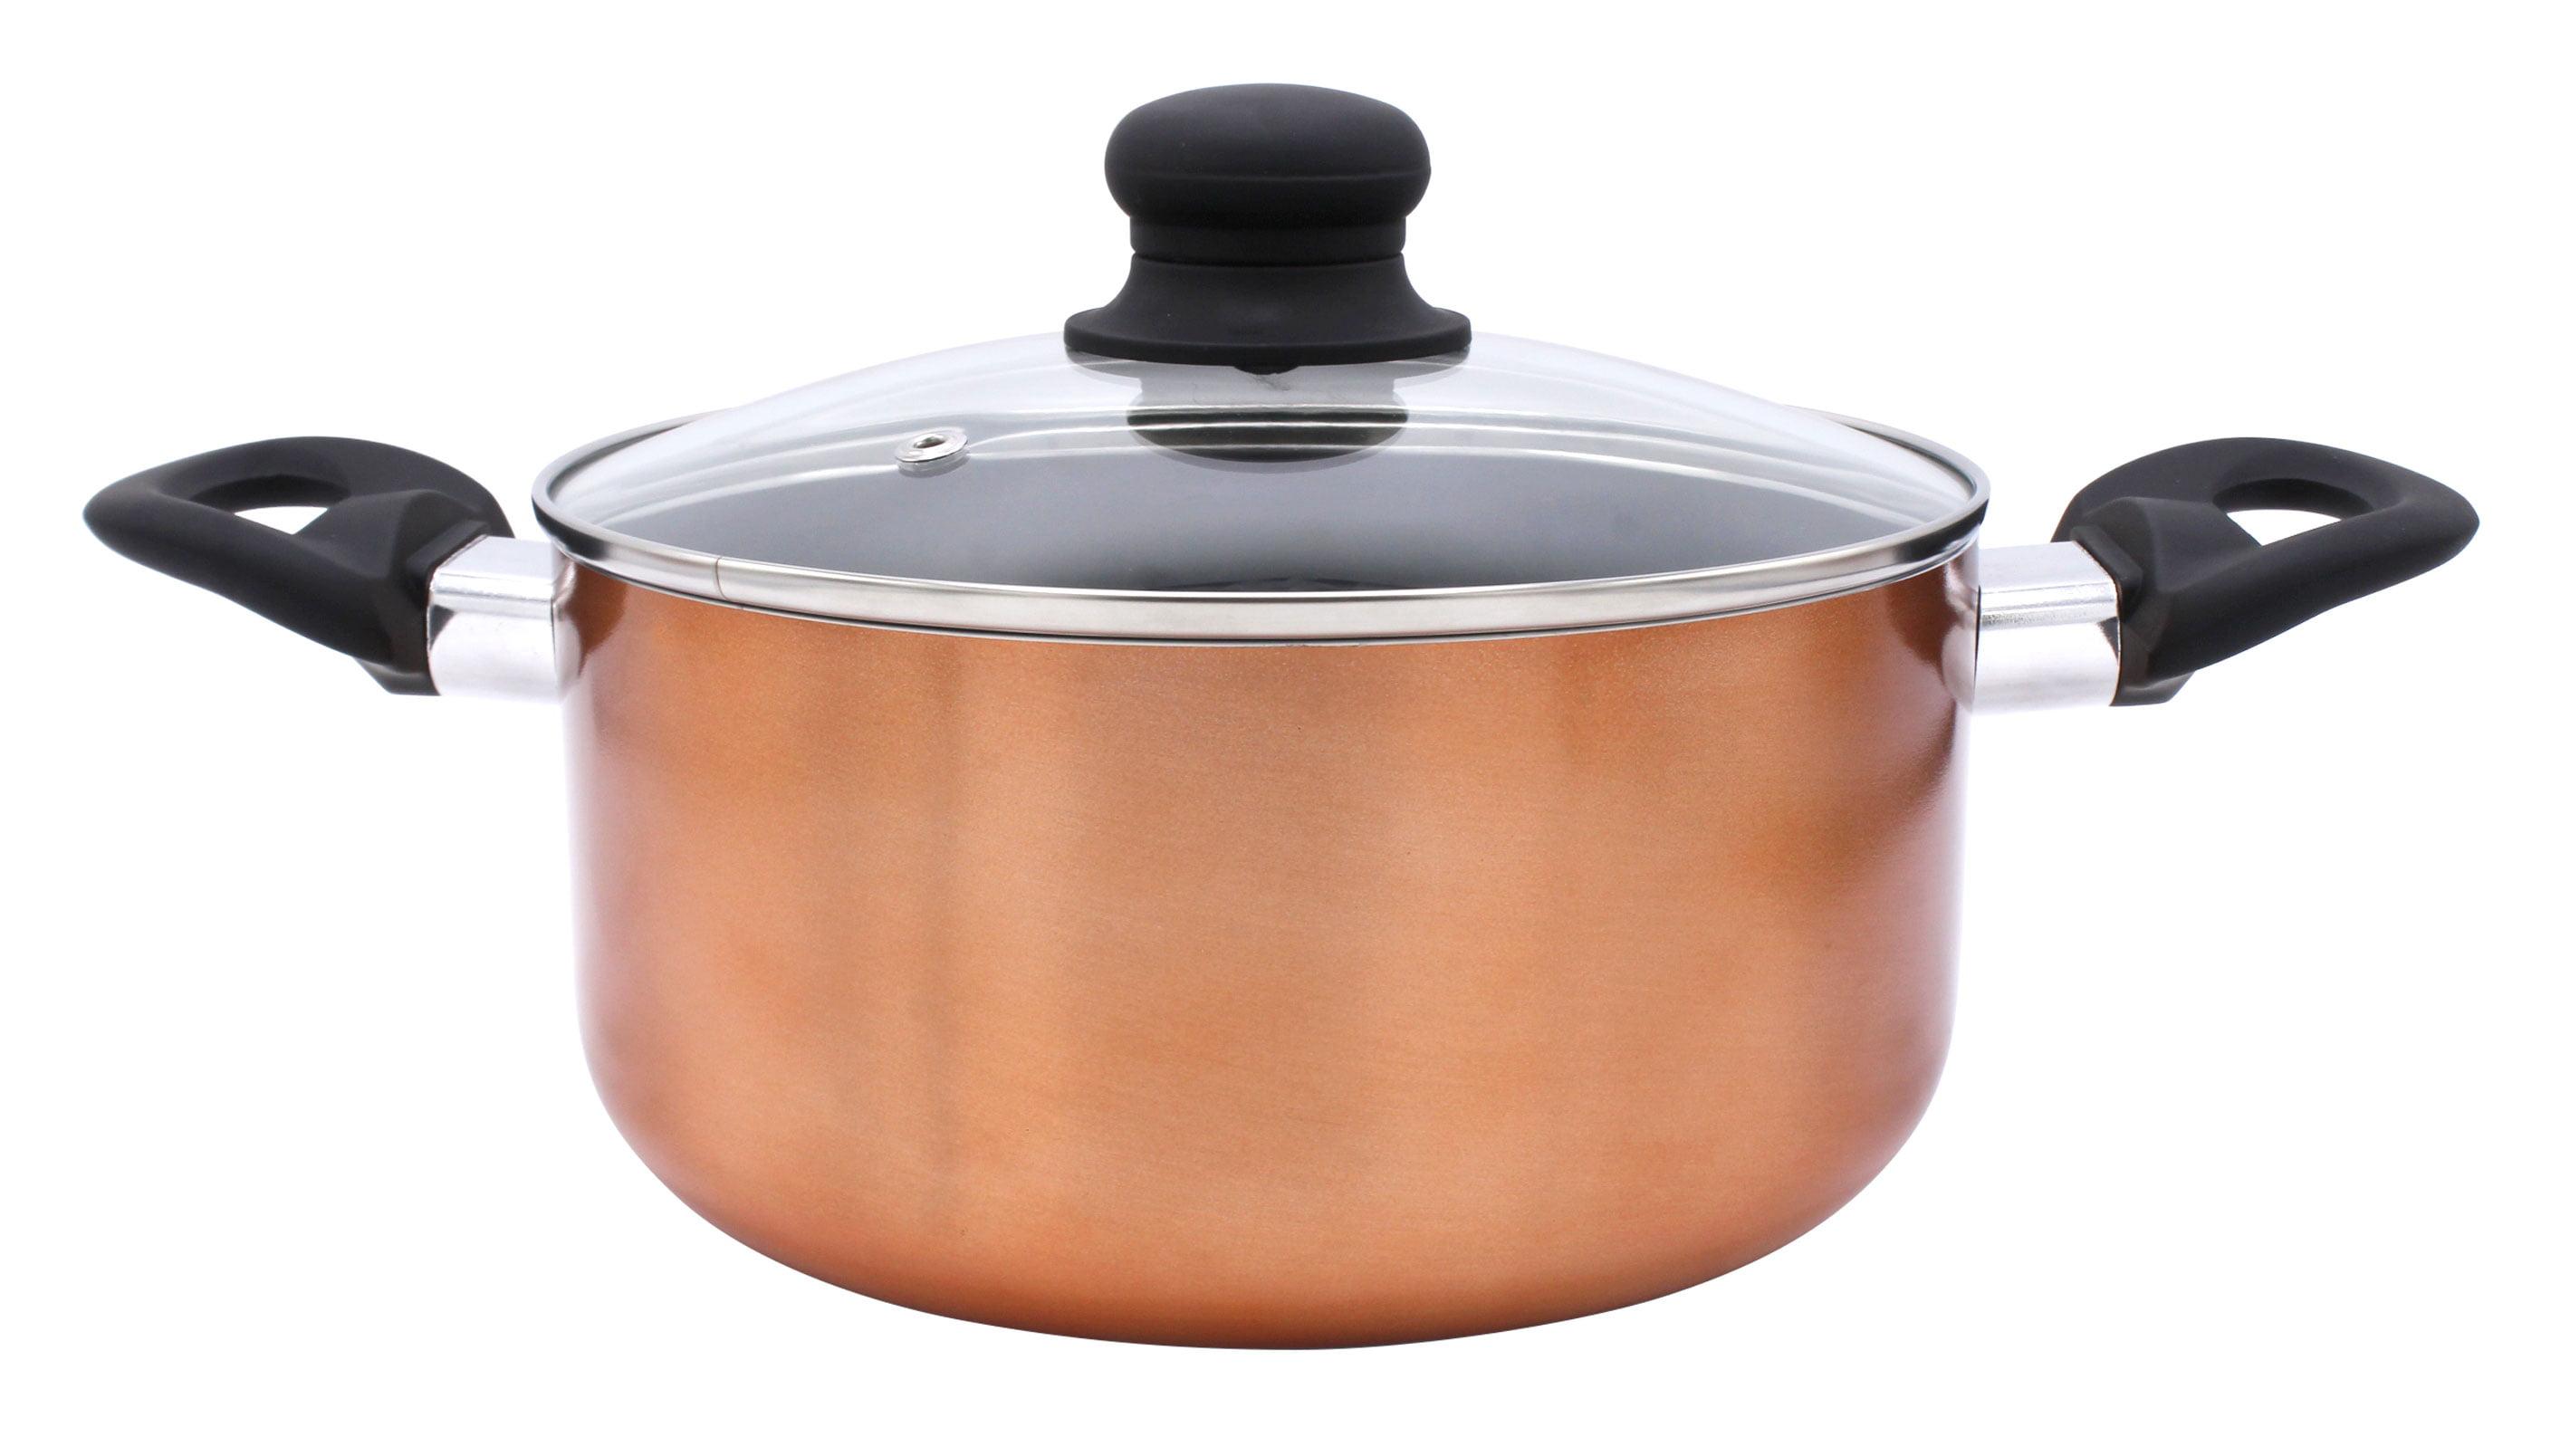 7PC NON STICK COOKWARE SET POT KITCHEN SAUCEPAN FRYING PAN CASSEROLE COPPER LID